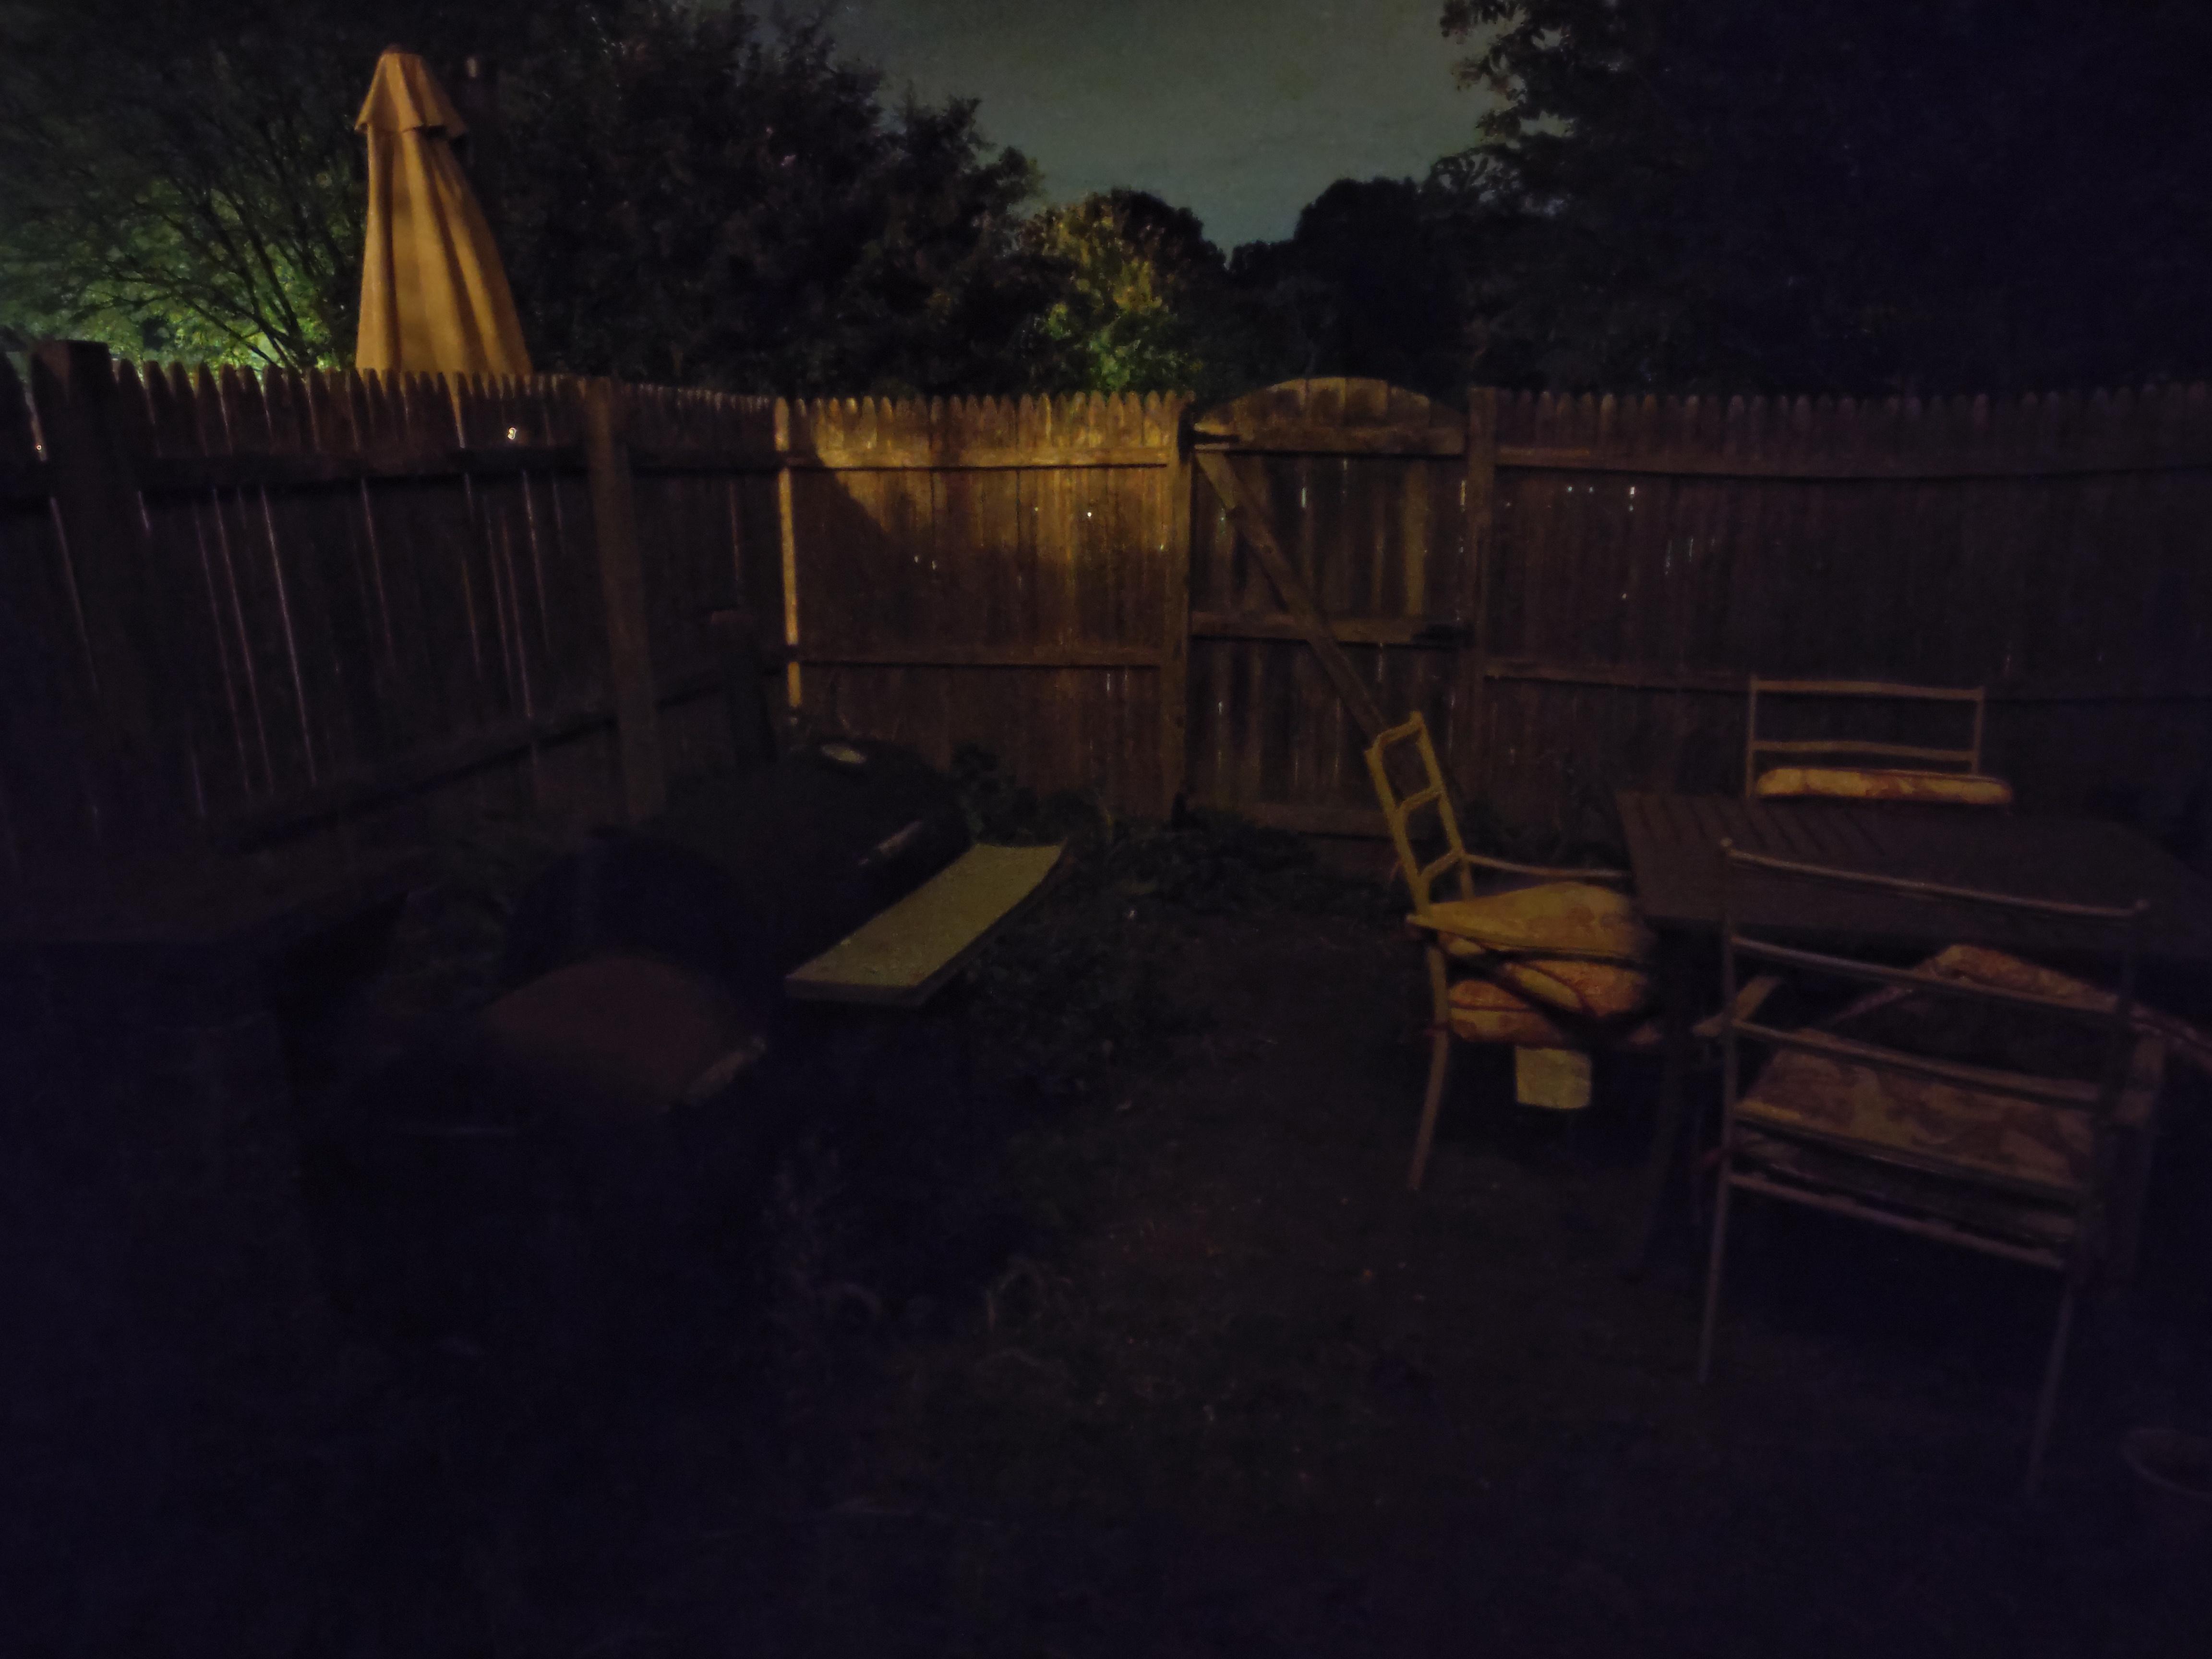 redmagic 6s pro review: night mode camera sample